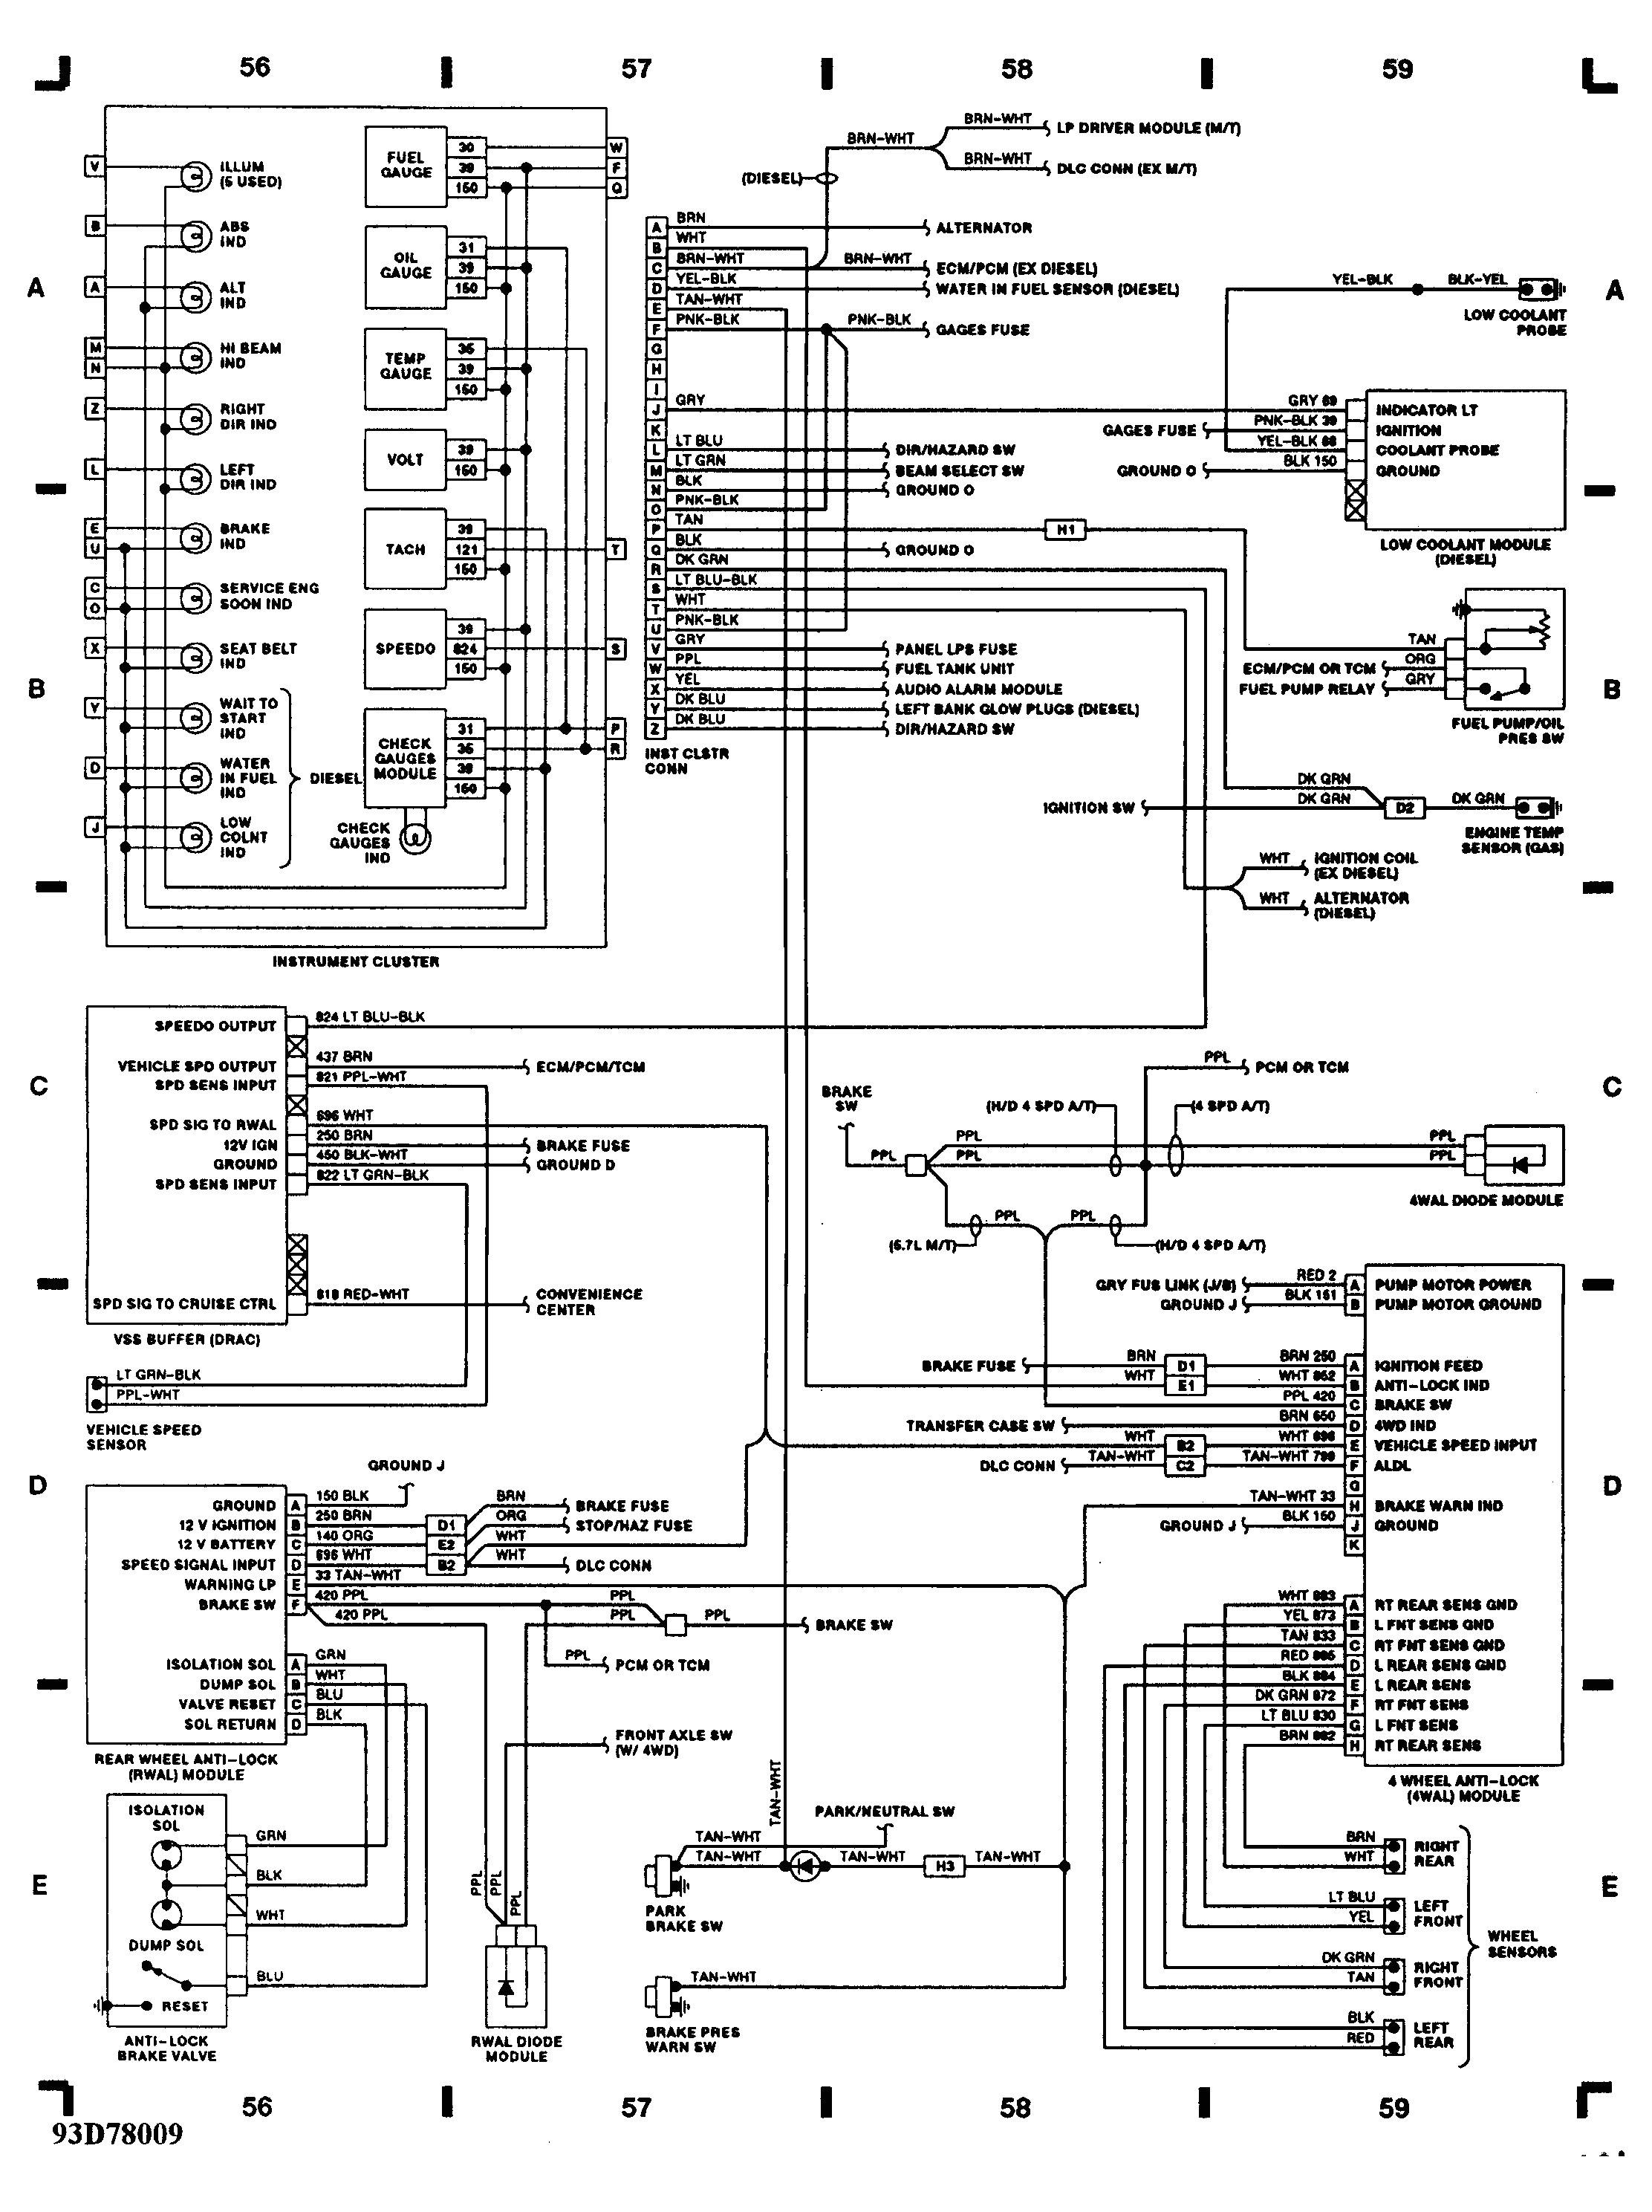 chevy 4 2 vortec engine diagram wiring diagram part chevy 4 3 vortec engine diagram wiring